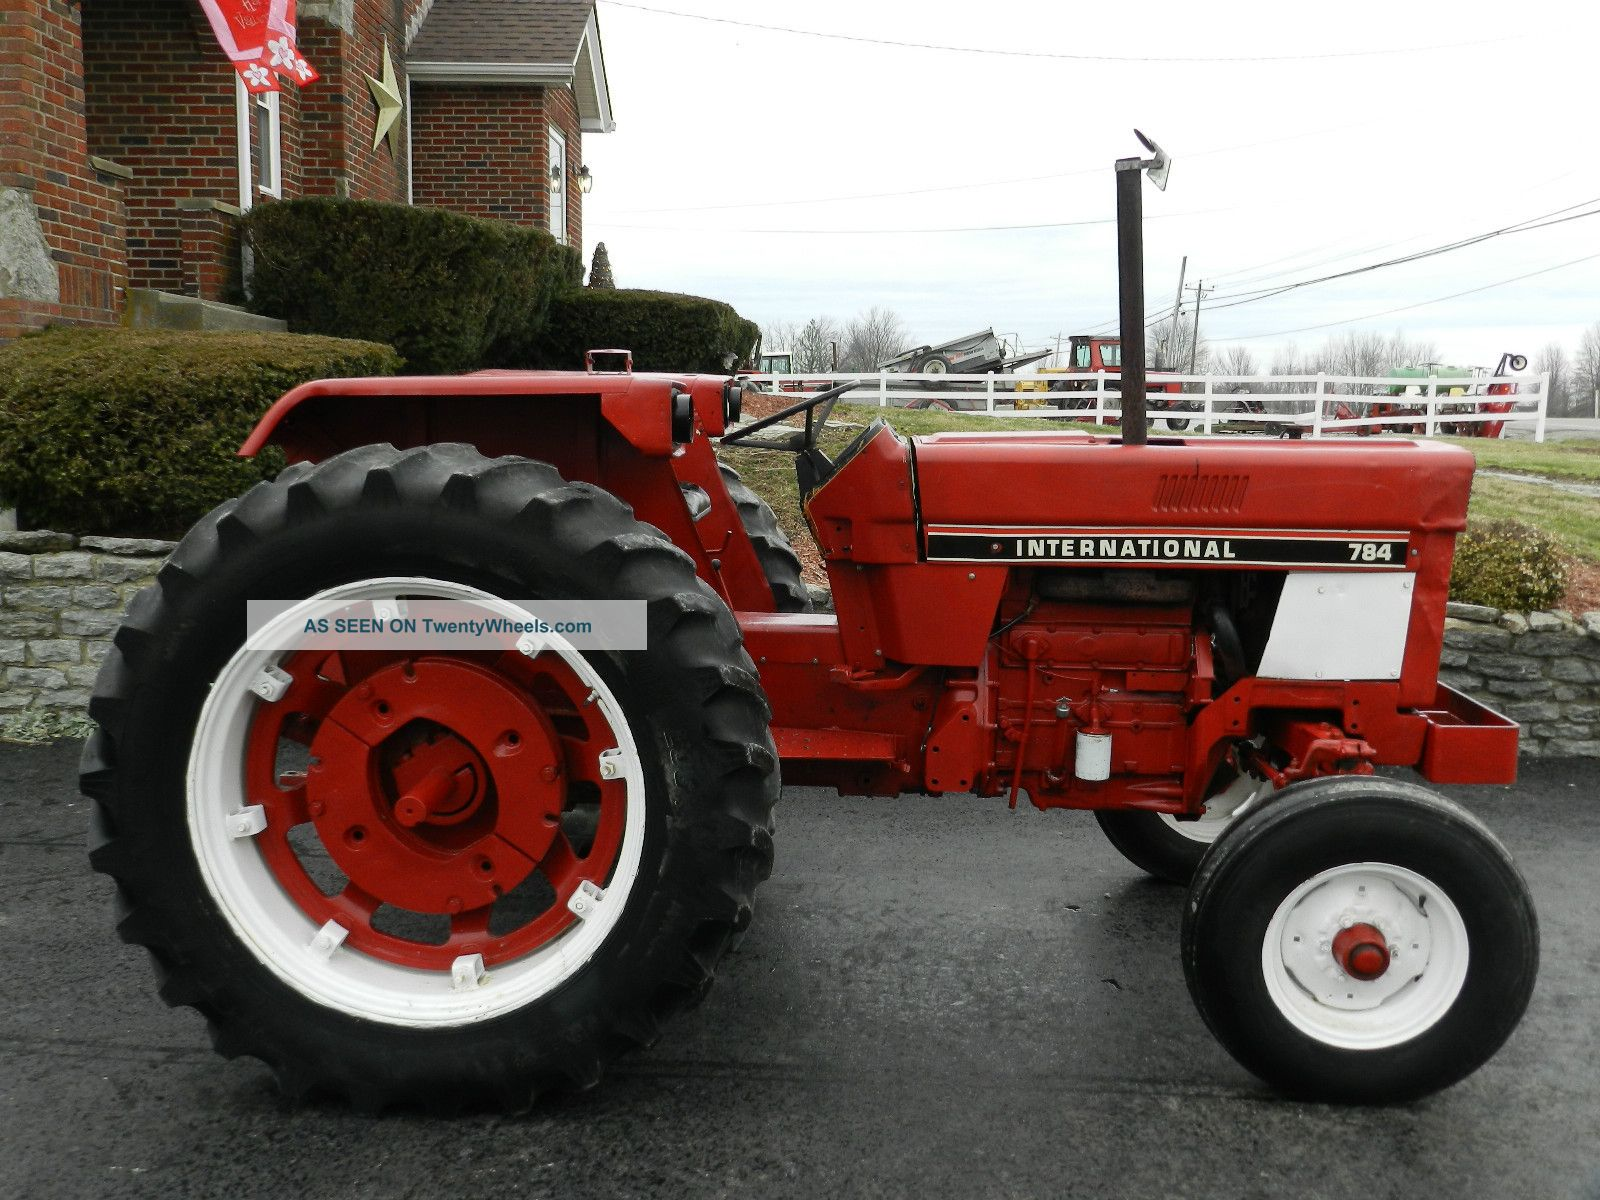 Escorts diesel tractor engines